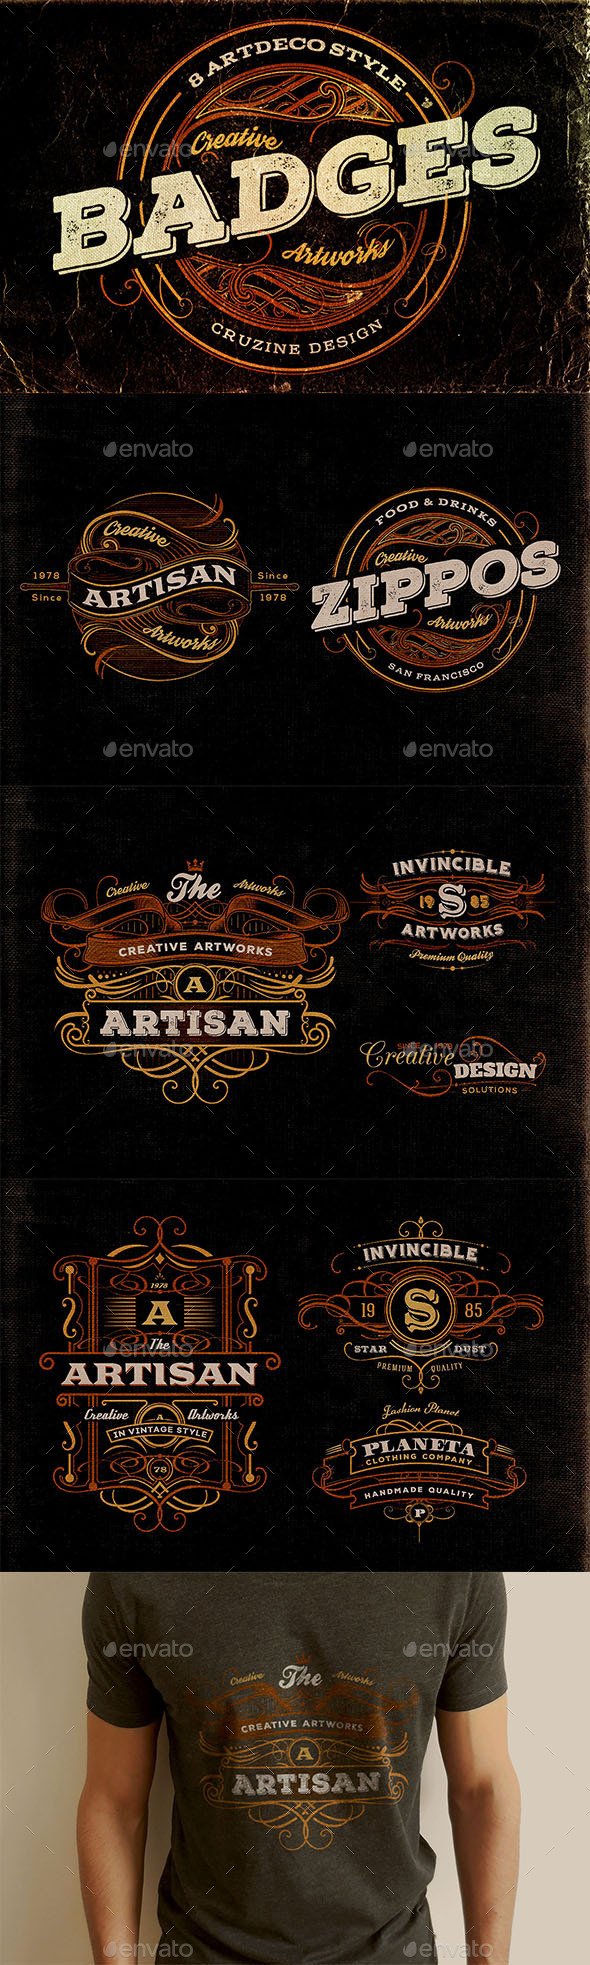 GraphicRiver 8 Artdeco Style Badges 11941033